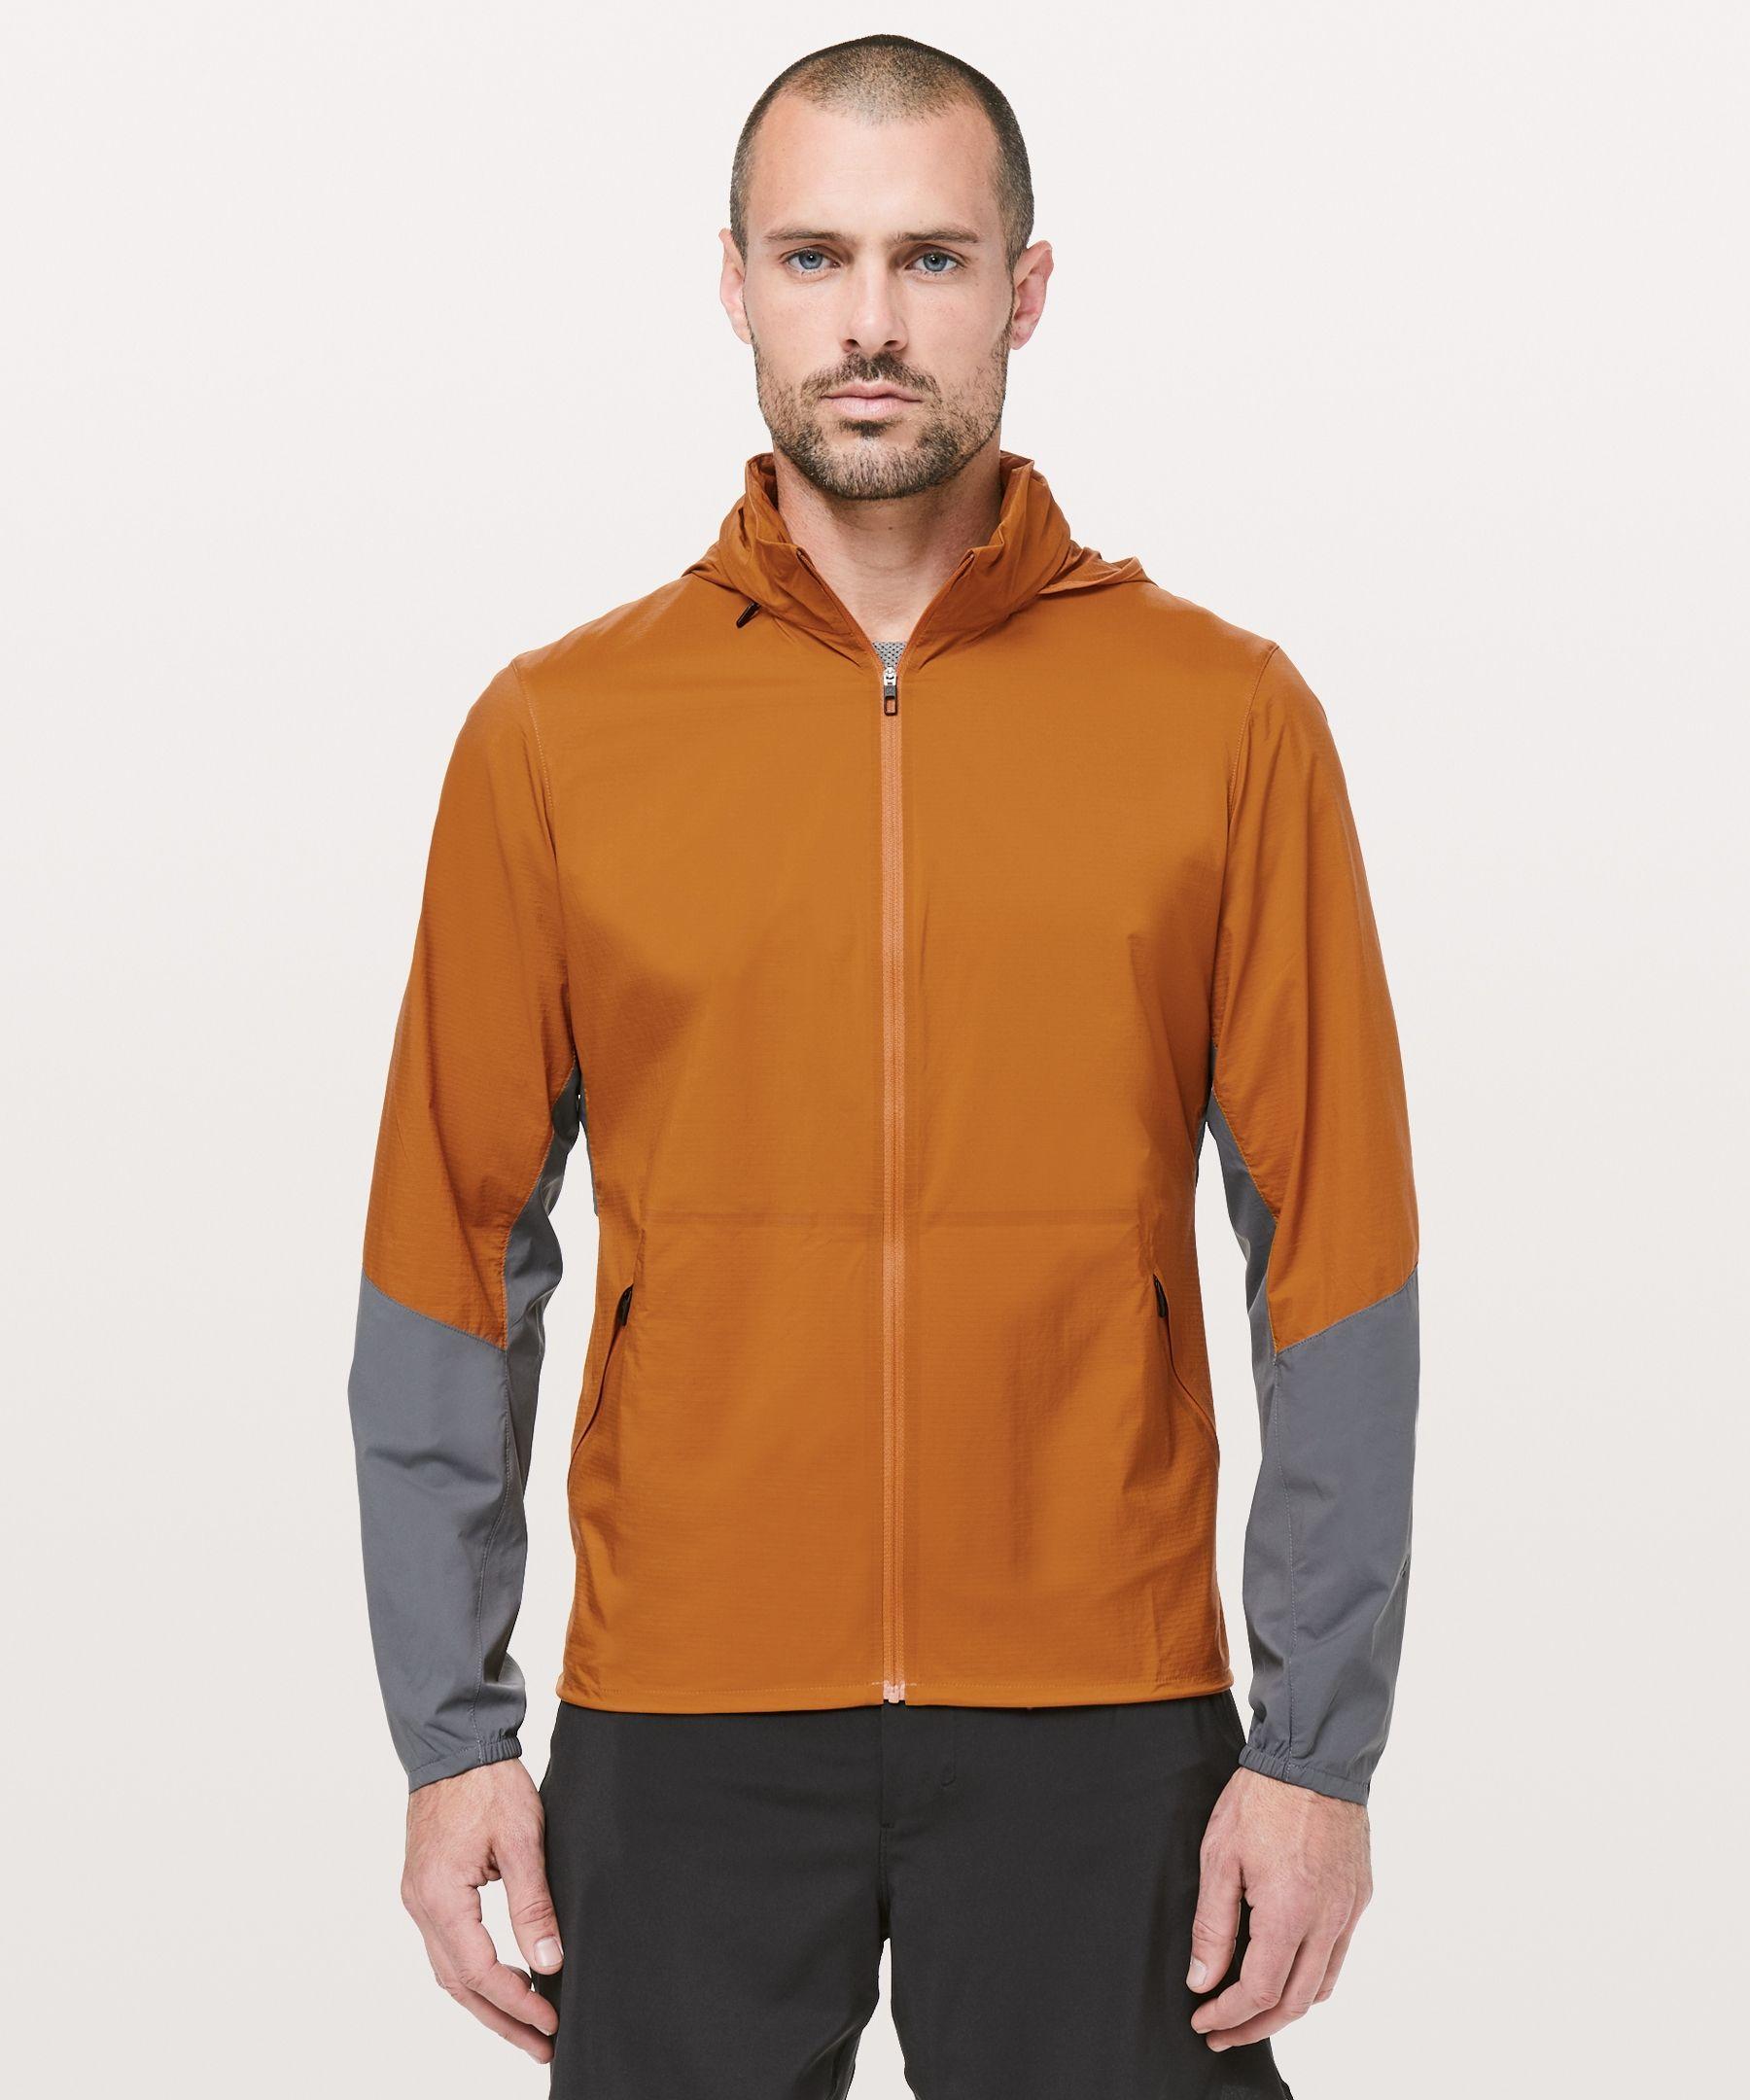 Lululemon Men S Active Jacket Fools Gold Anchor Size Xs Active Jacket Womens Active Jacket Jackets [ 2160 x 1800 Pixel ]